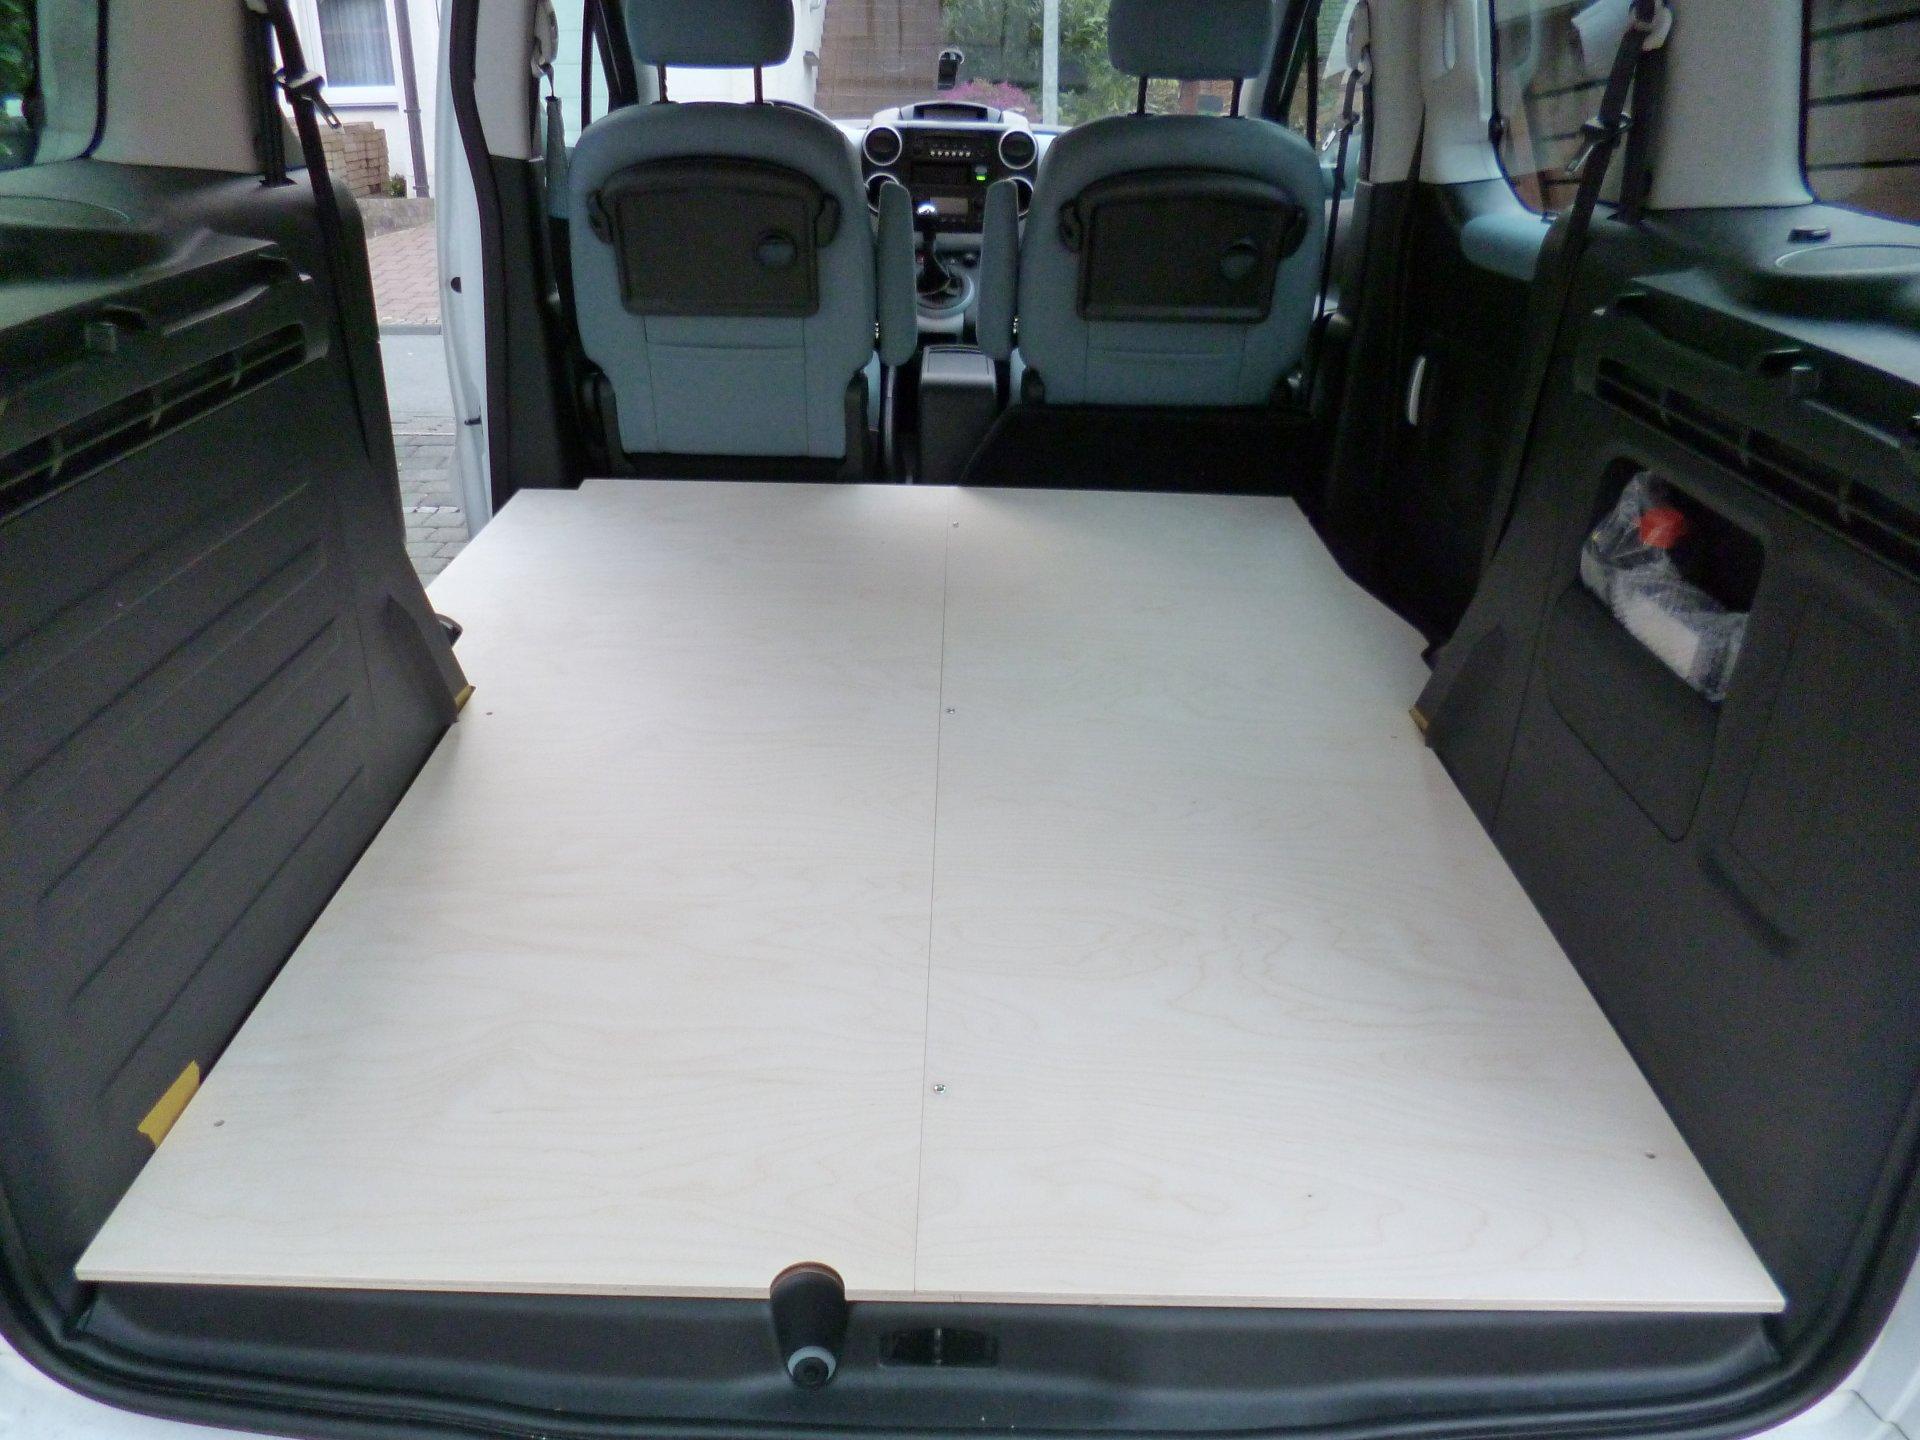 citroen berlingo camping bett das campingsystem f r ihr. Black Bedroom Furniture Sets. Home Design Ideas